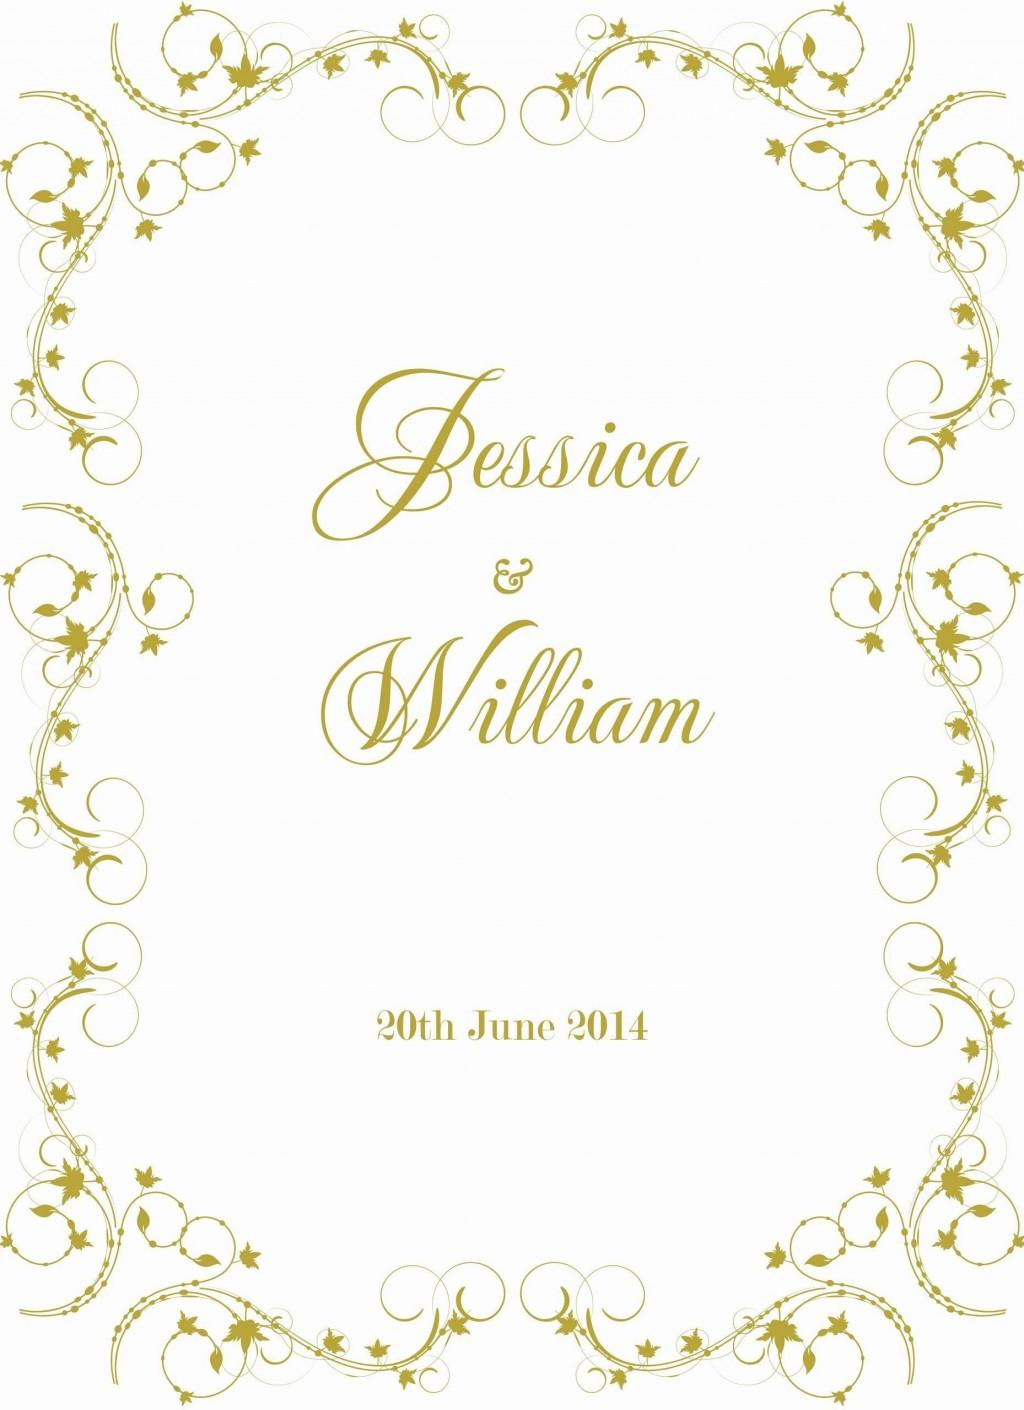 001 Striking Formal Wedding Invitation Template Free Image Large